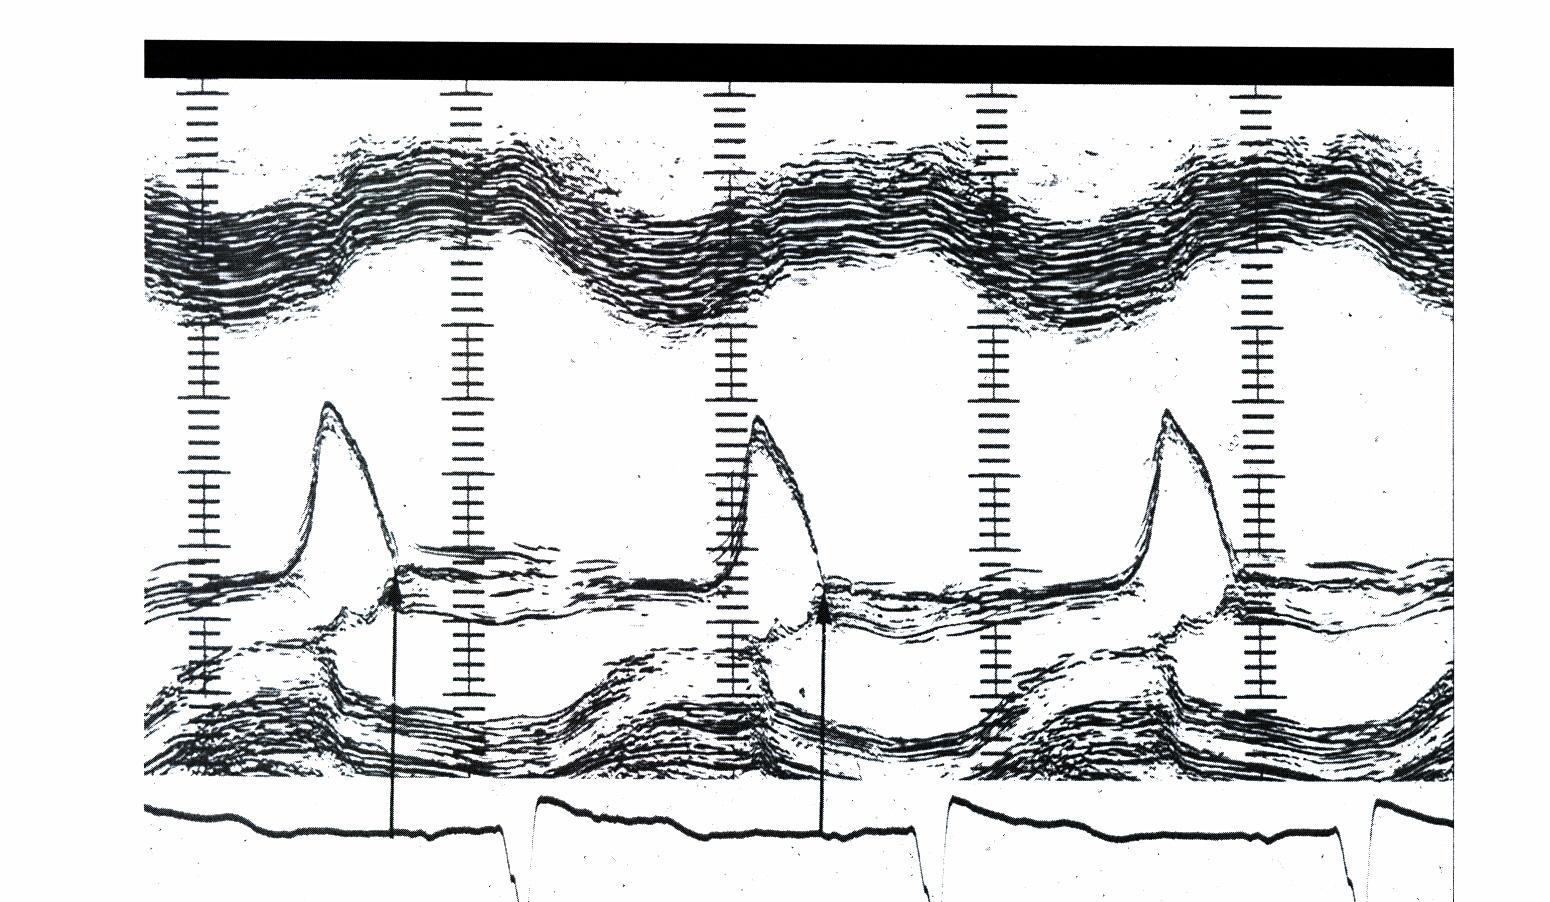 Acute Severe Aortic Regurgitation